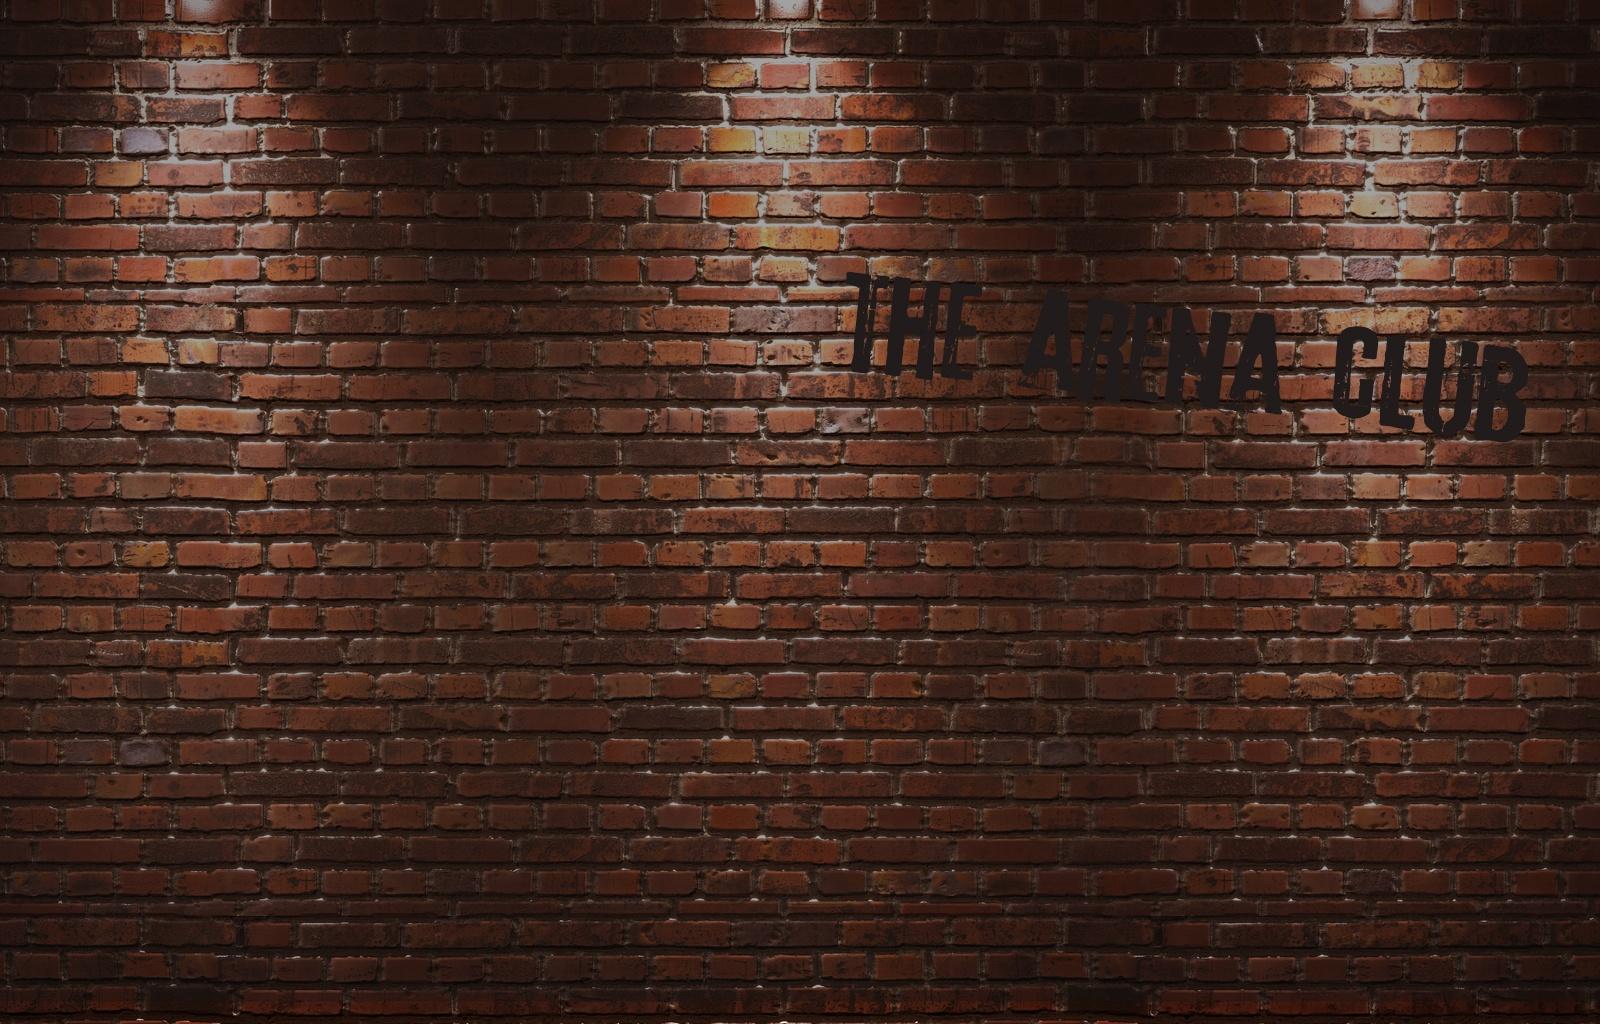 brickwallcycling.jpg